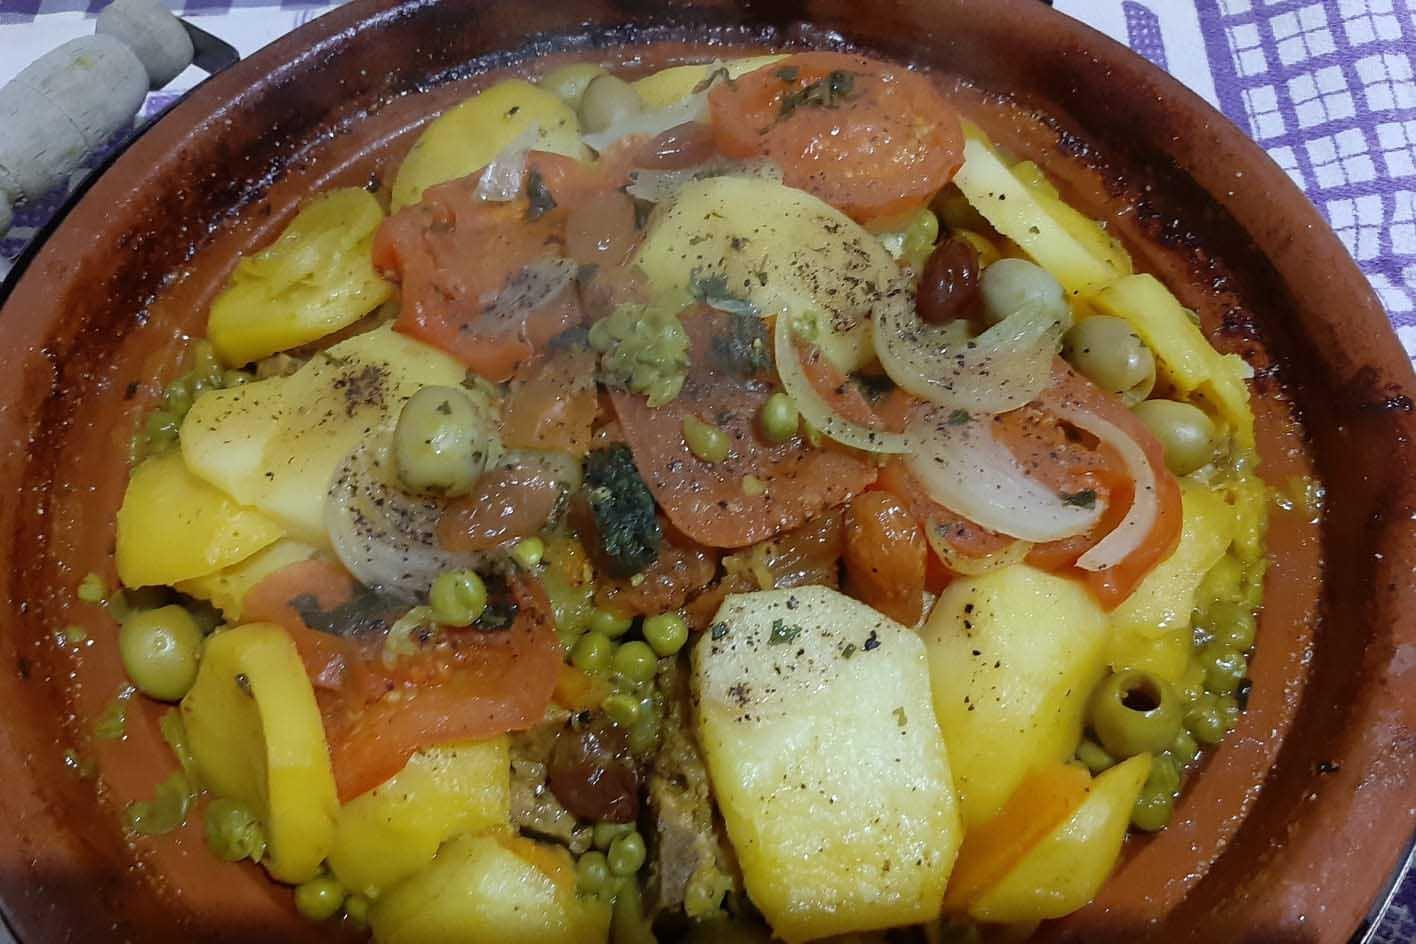 piatti della cucina marocchina ed egiziana Bar shisha Nura Iskendreia